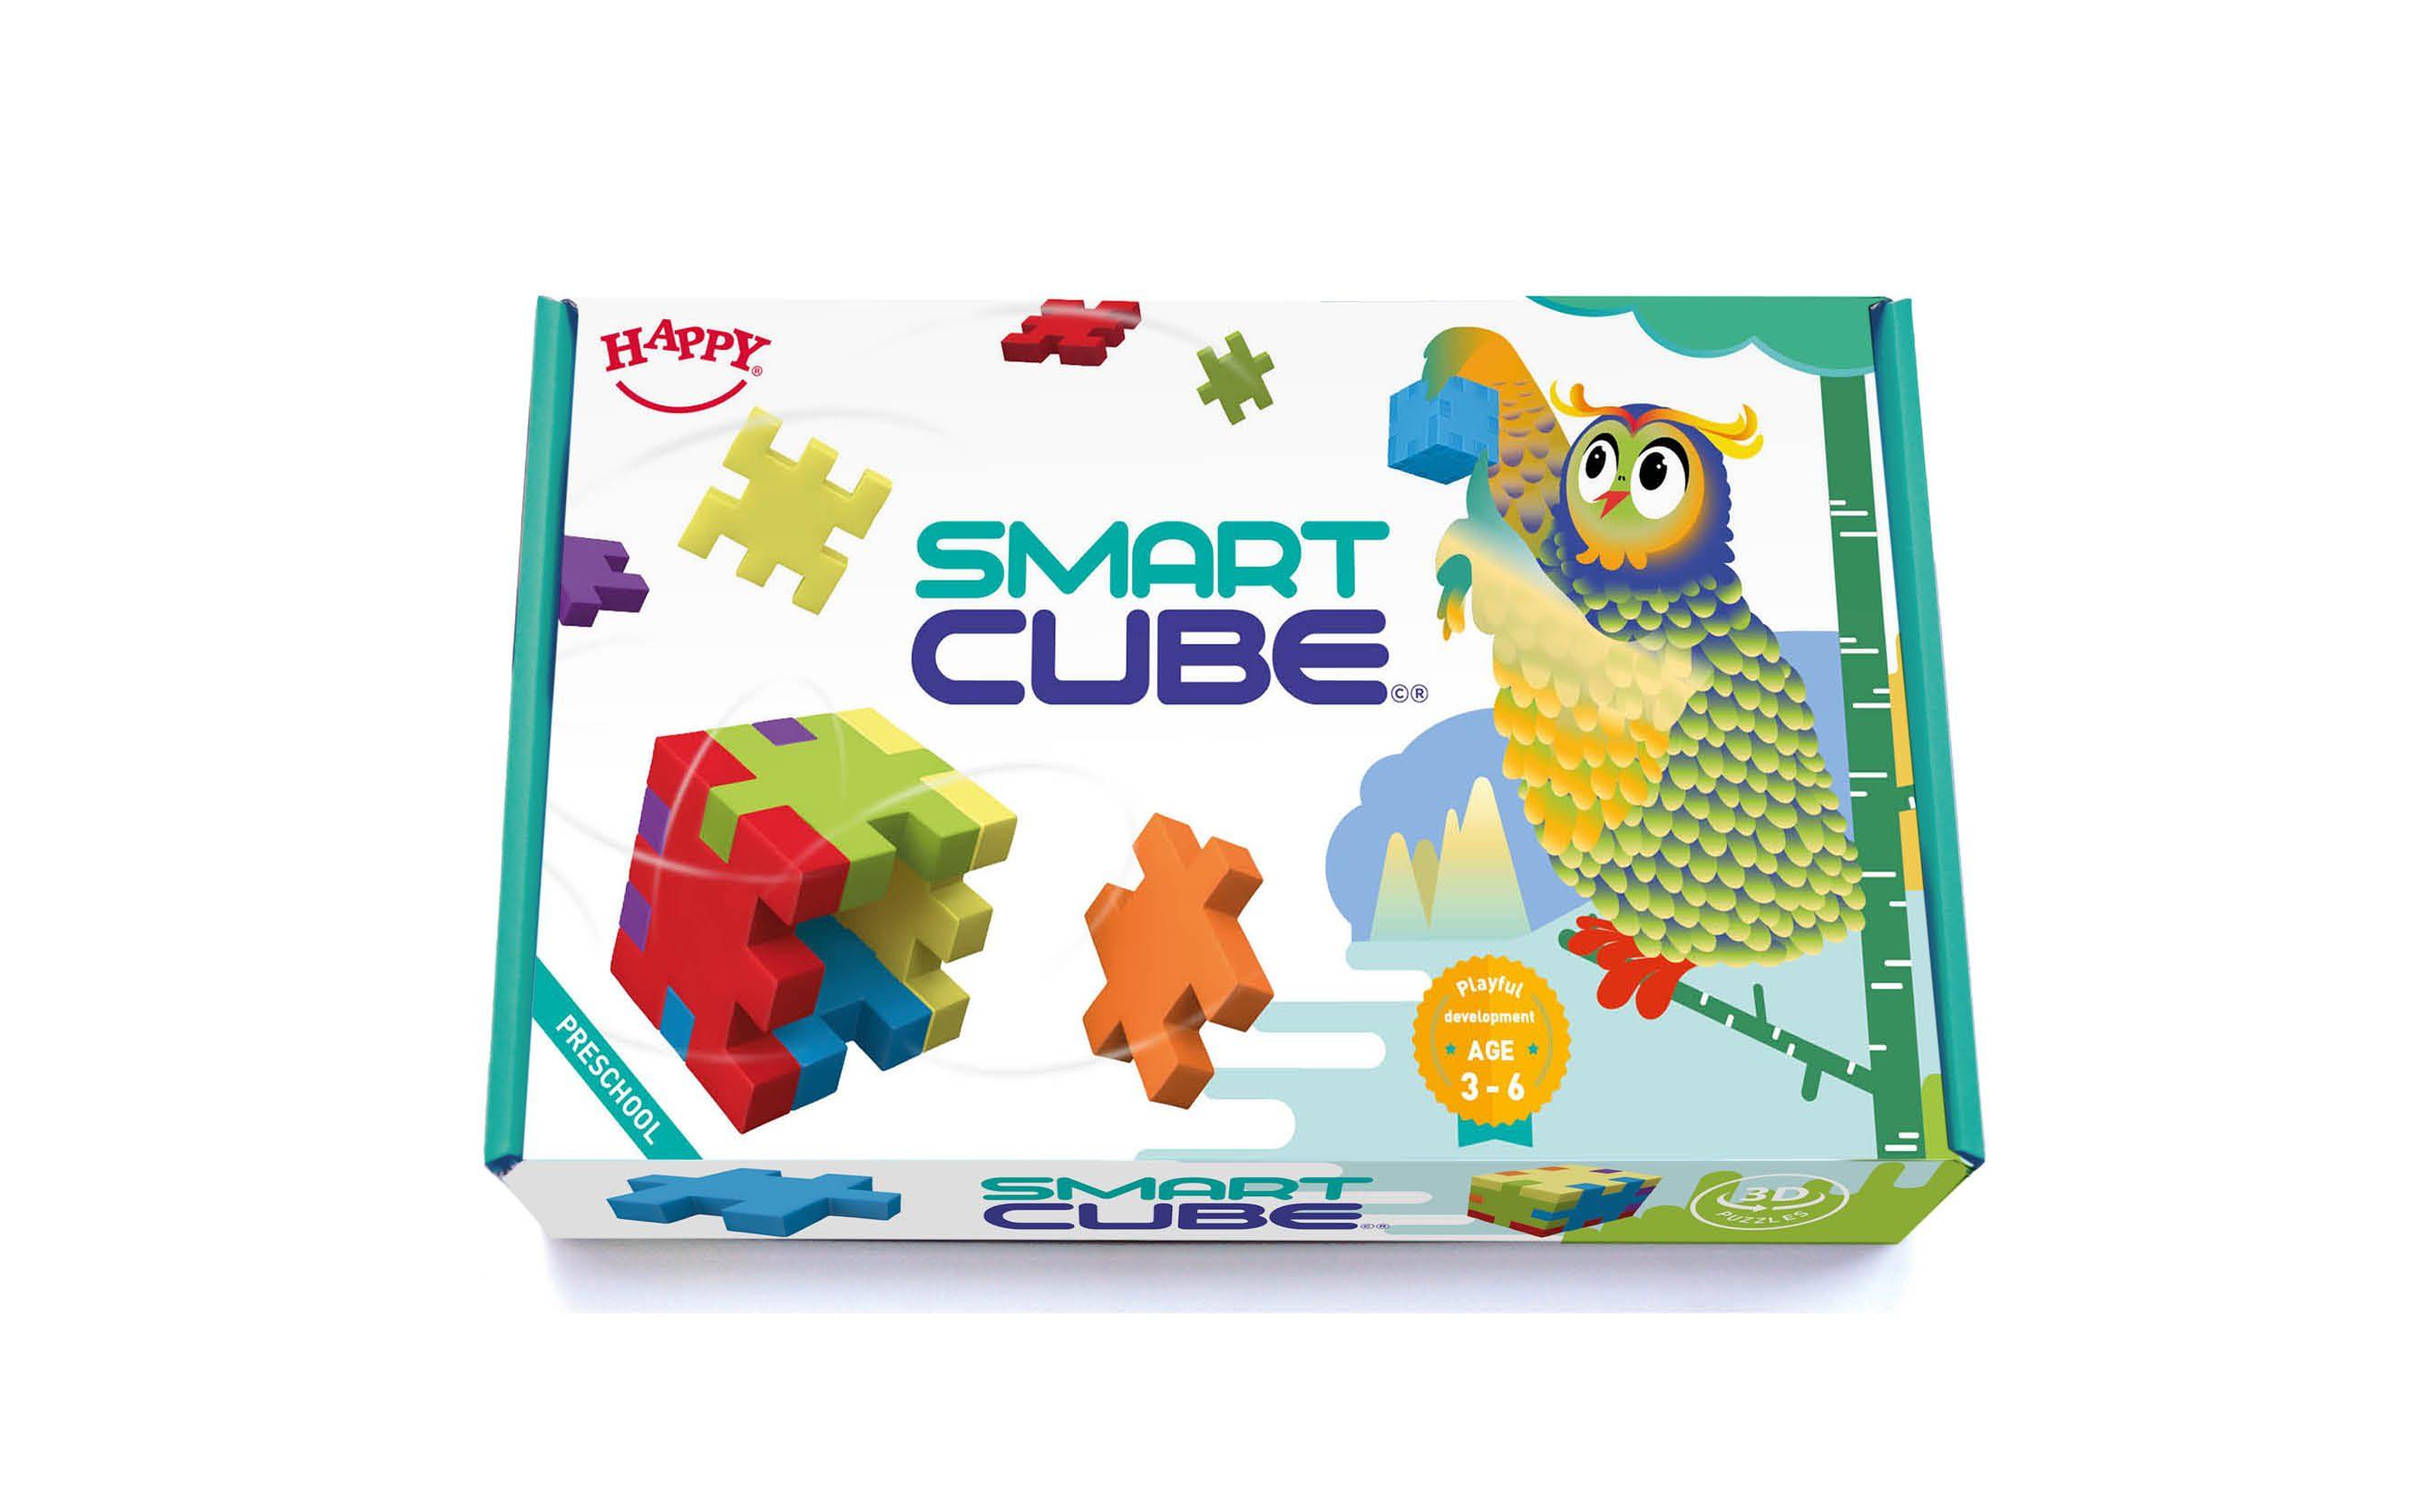 Happy_Smart_Cube_6-pack-giftbox-educational-preschool-puzzles